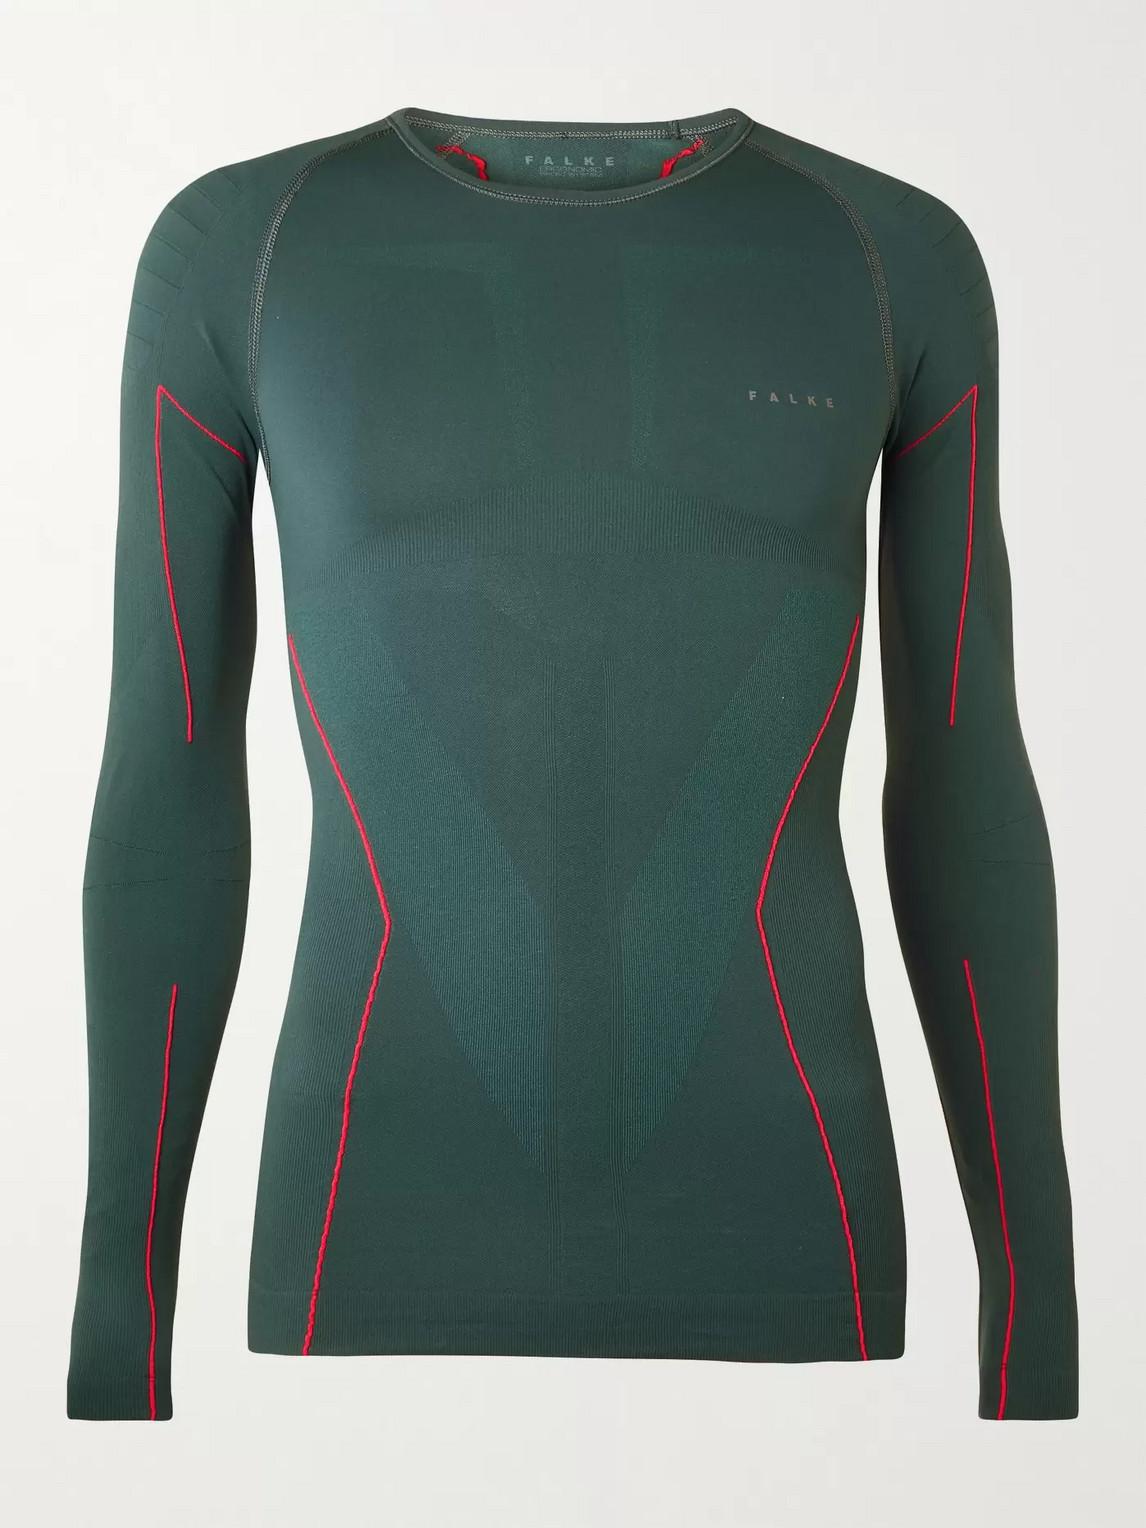 falke ergonomic sport system - stretch-jersey t-shirt - men - green